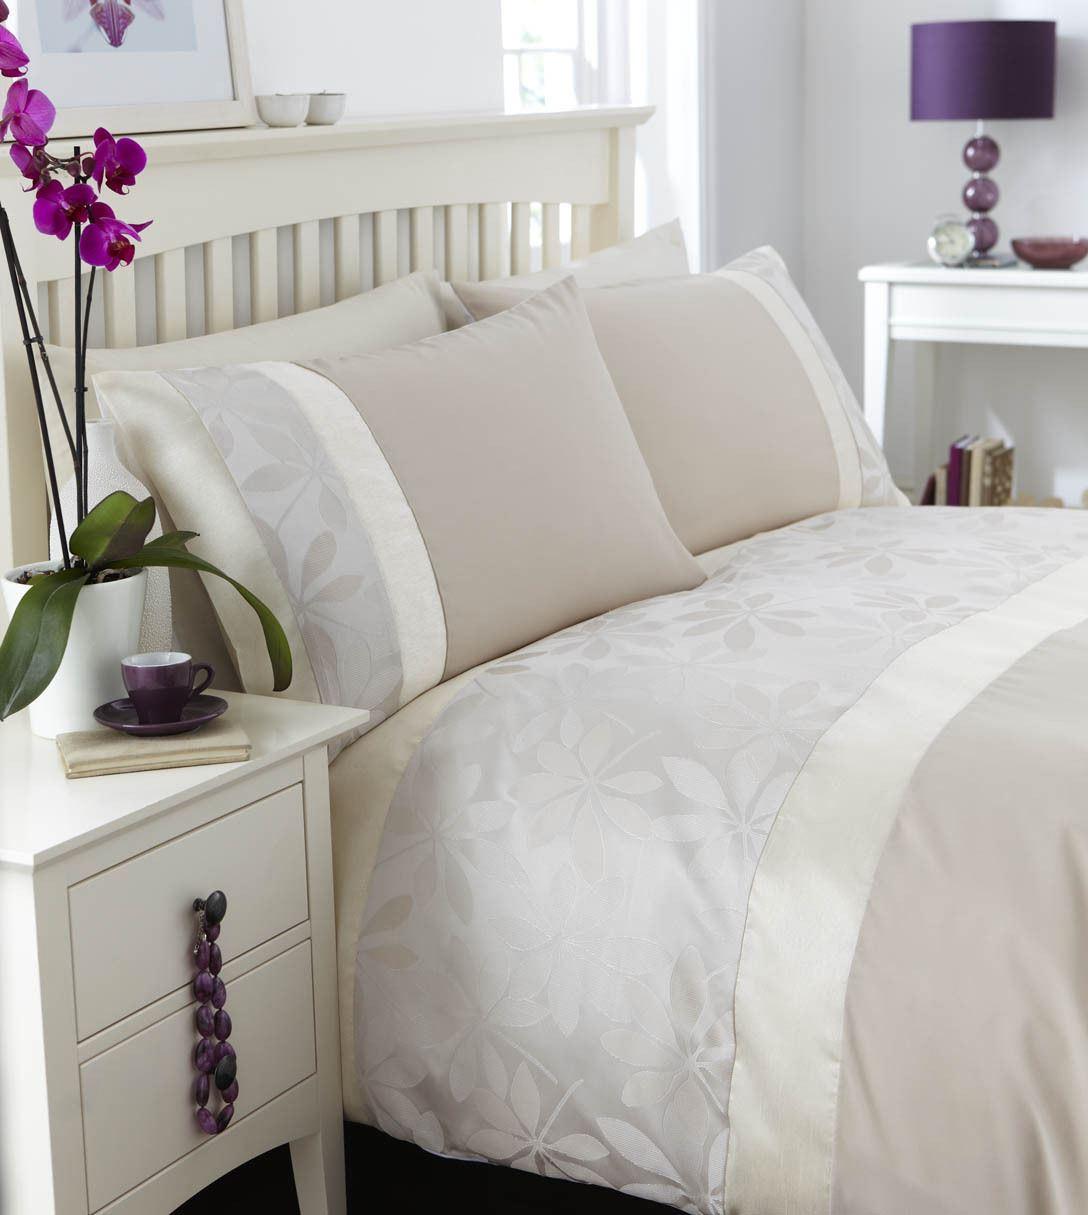 couette double. Black Bedroom Furniture Sets. Home Design Ideas